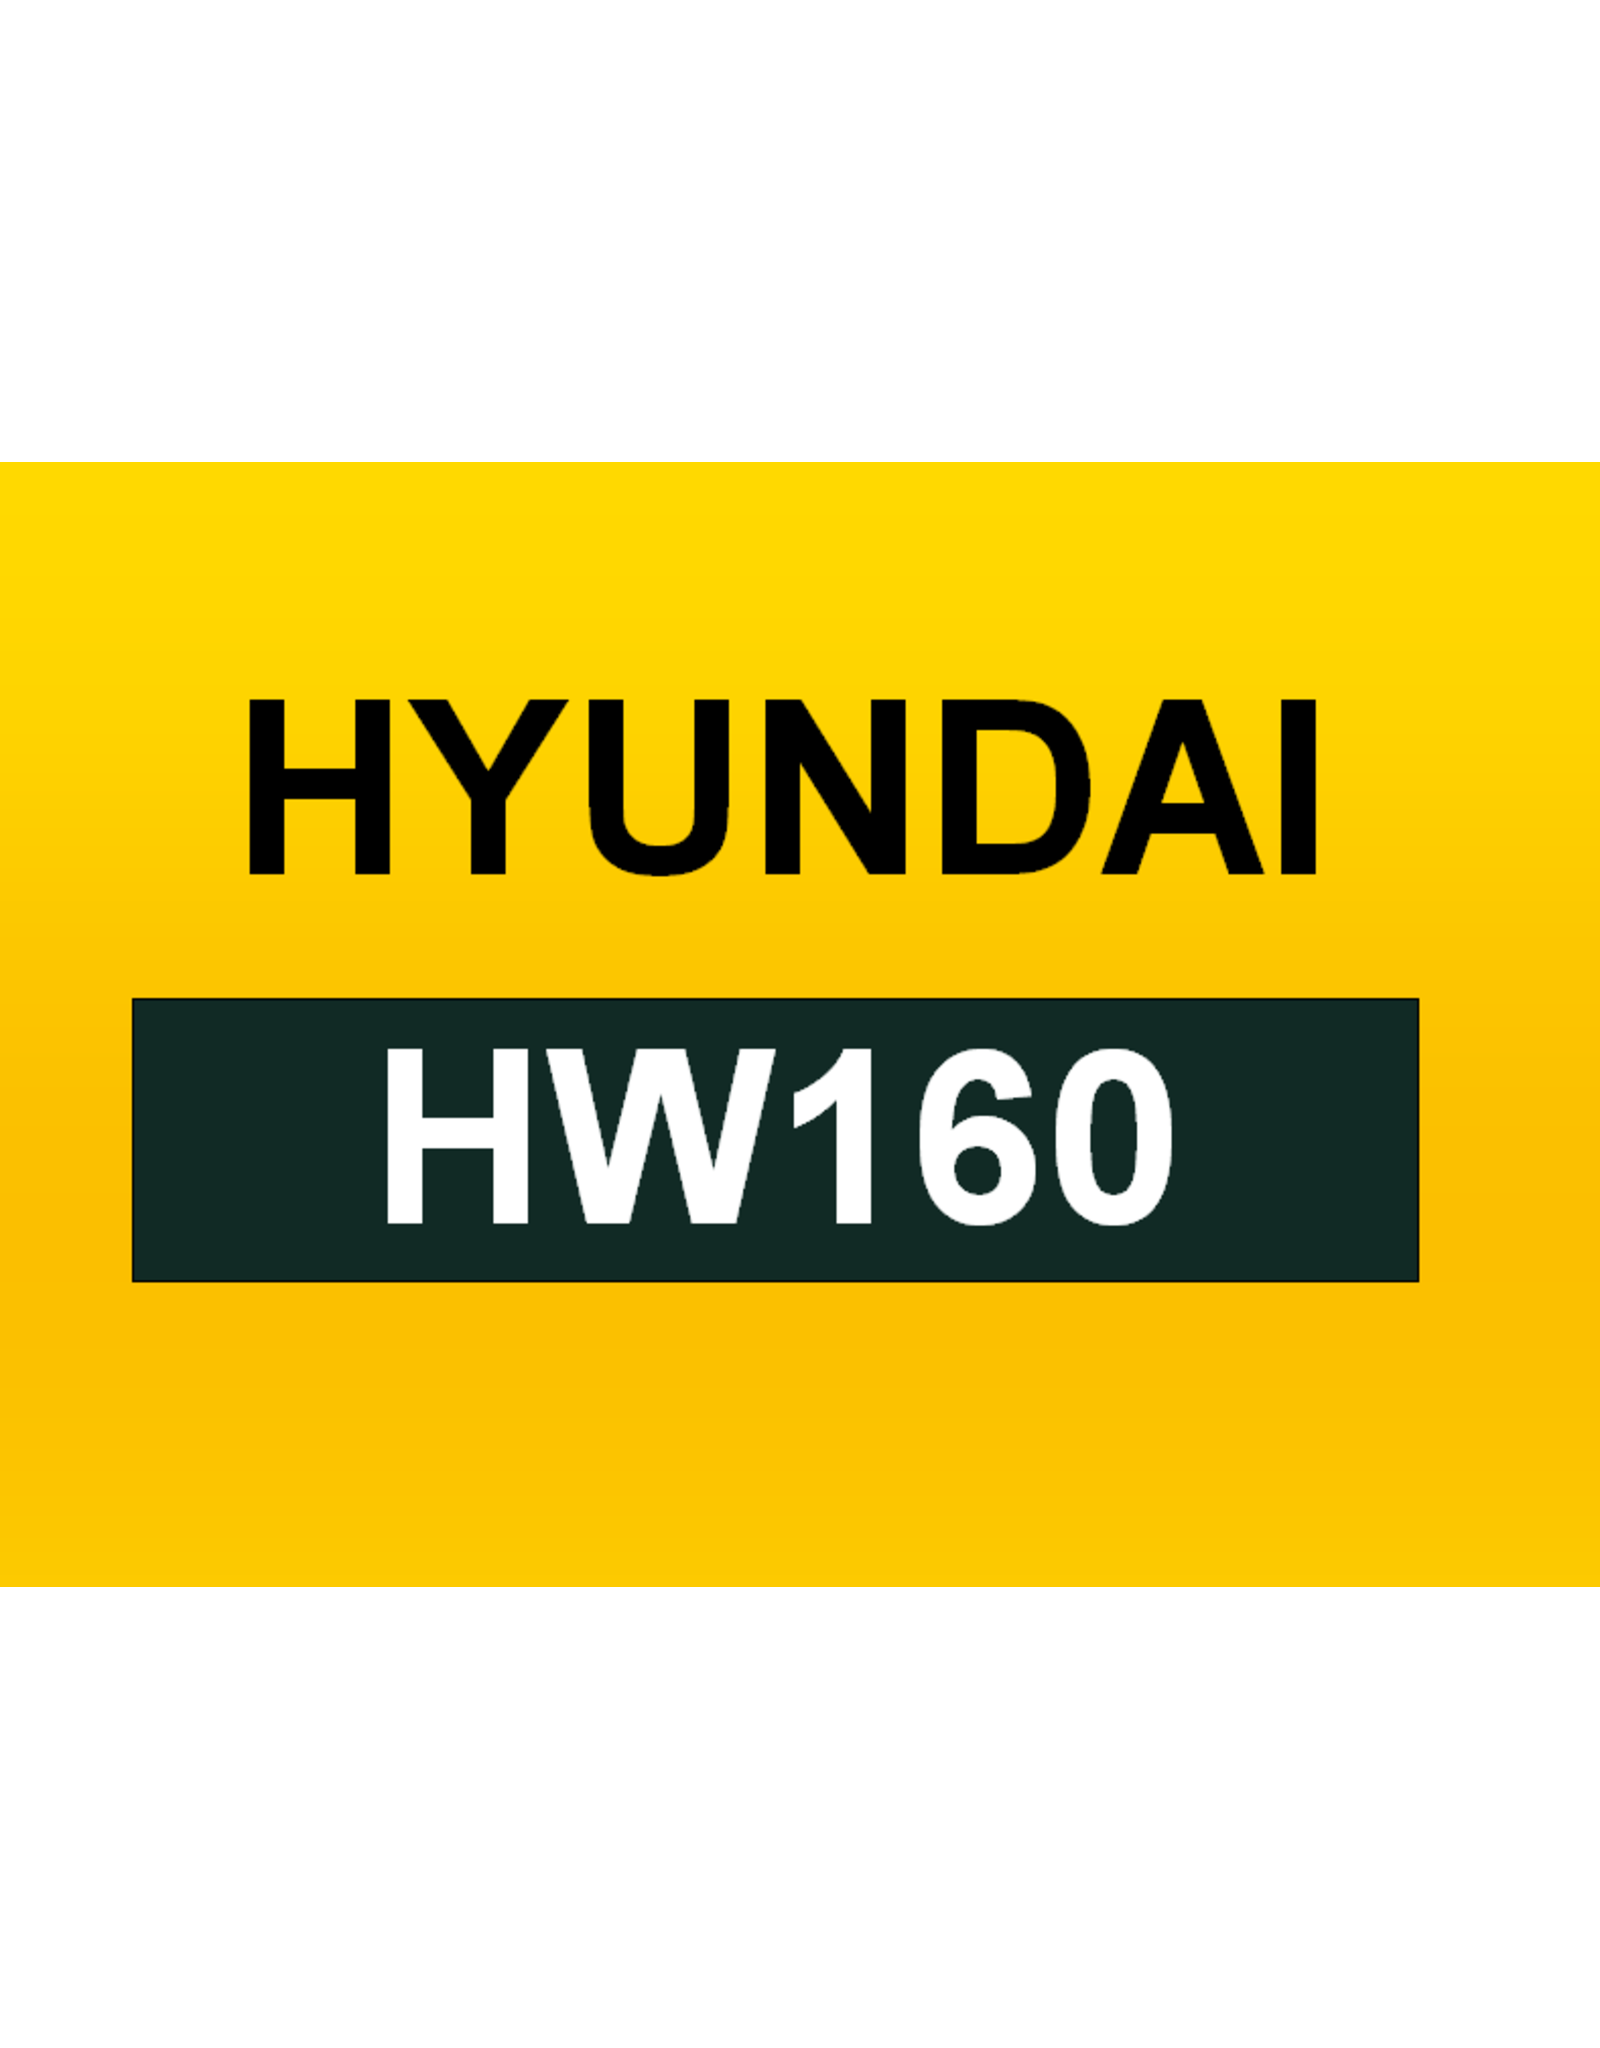 Echle Hartstahl GmbH FOPS für Hyundai HW160